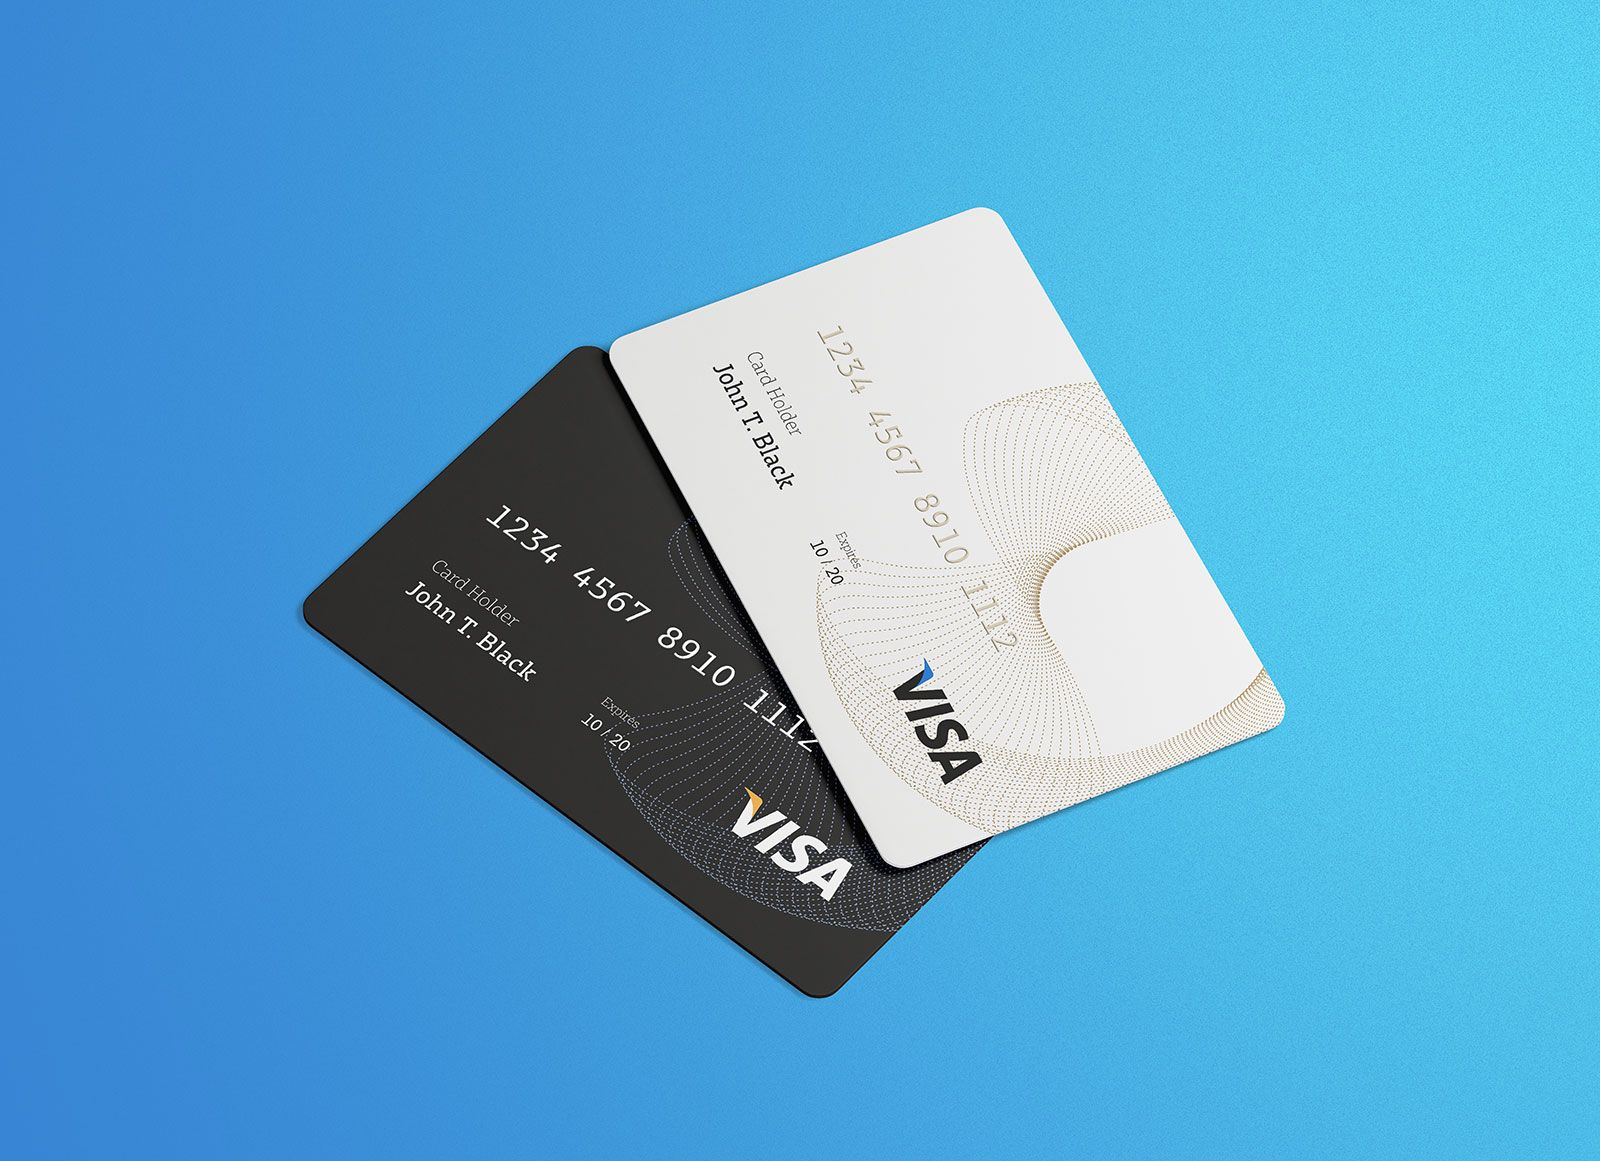 Free Credit Visa Card Mockup Psd Good Mockups Visa Card Business Card Inspiration Diy Business Cards